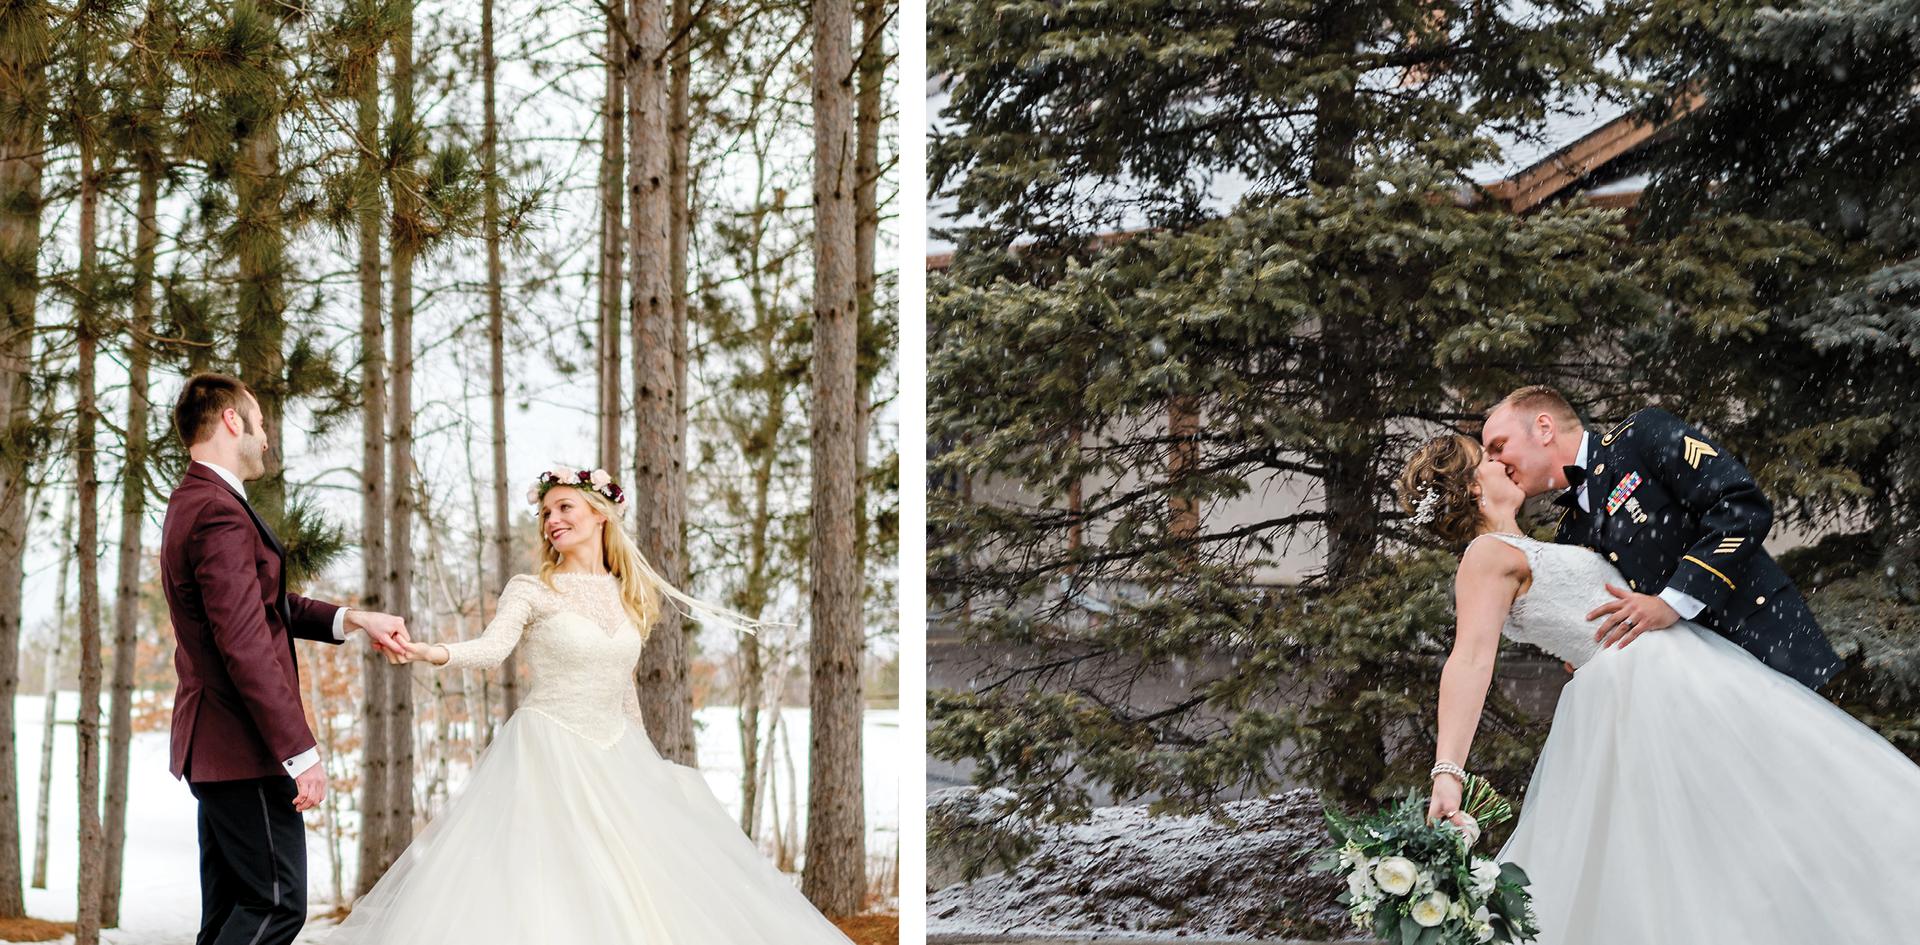 Wedding Location Packet (Winter 2017)8.p